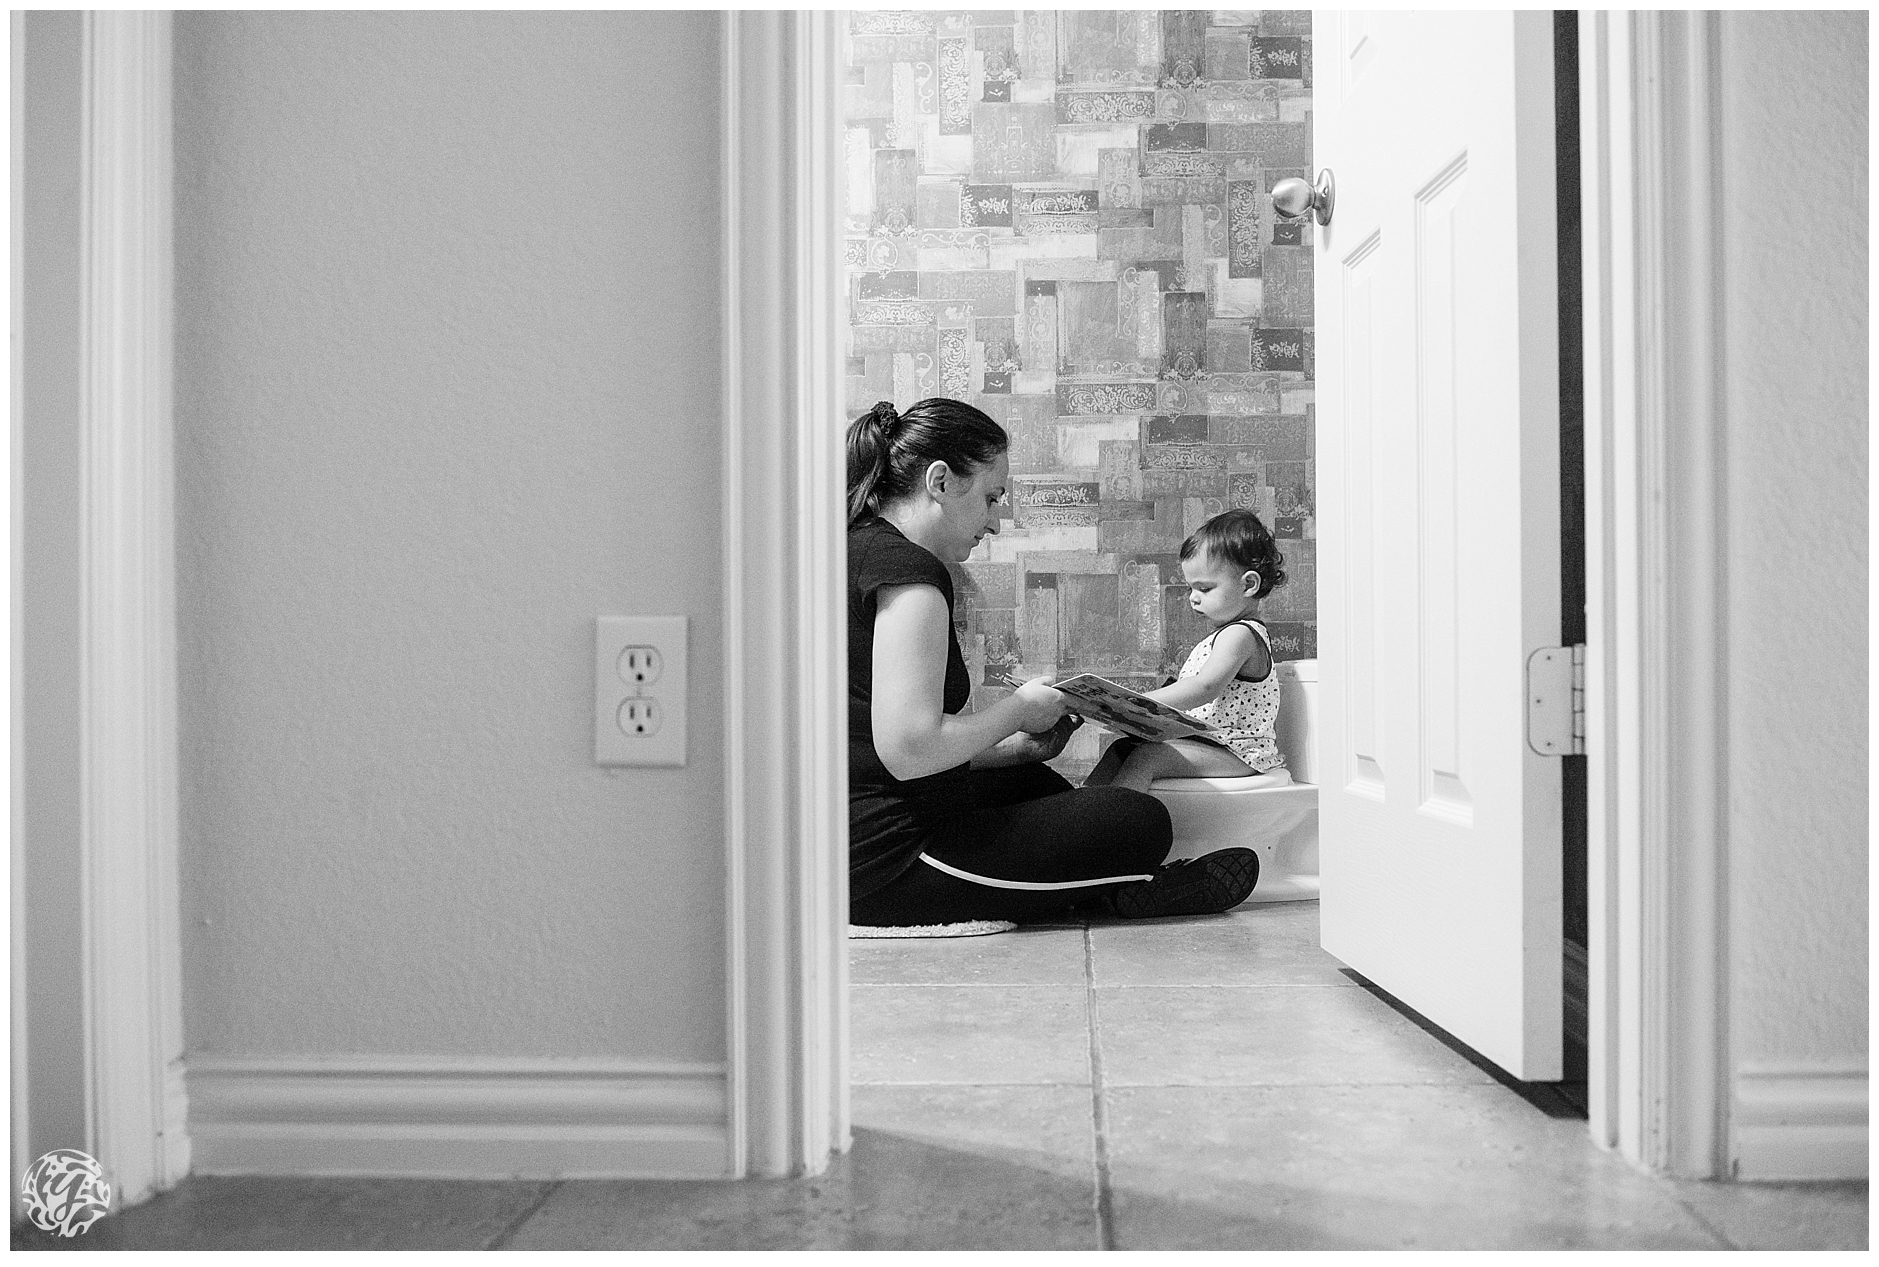 Yana's Photos Lifestyle photography-baby sitting on toilet-Edit.jpg